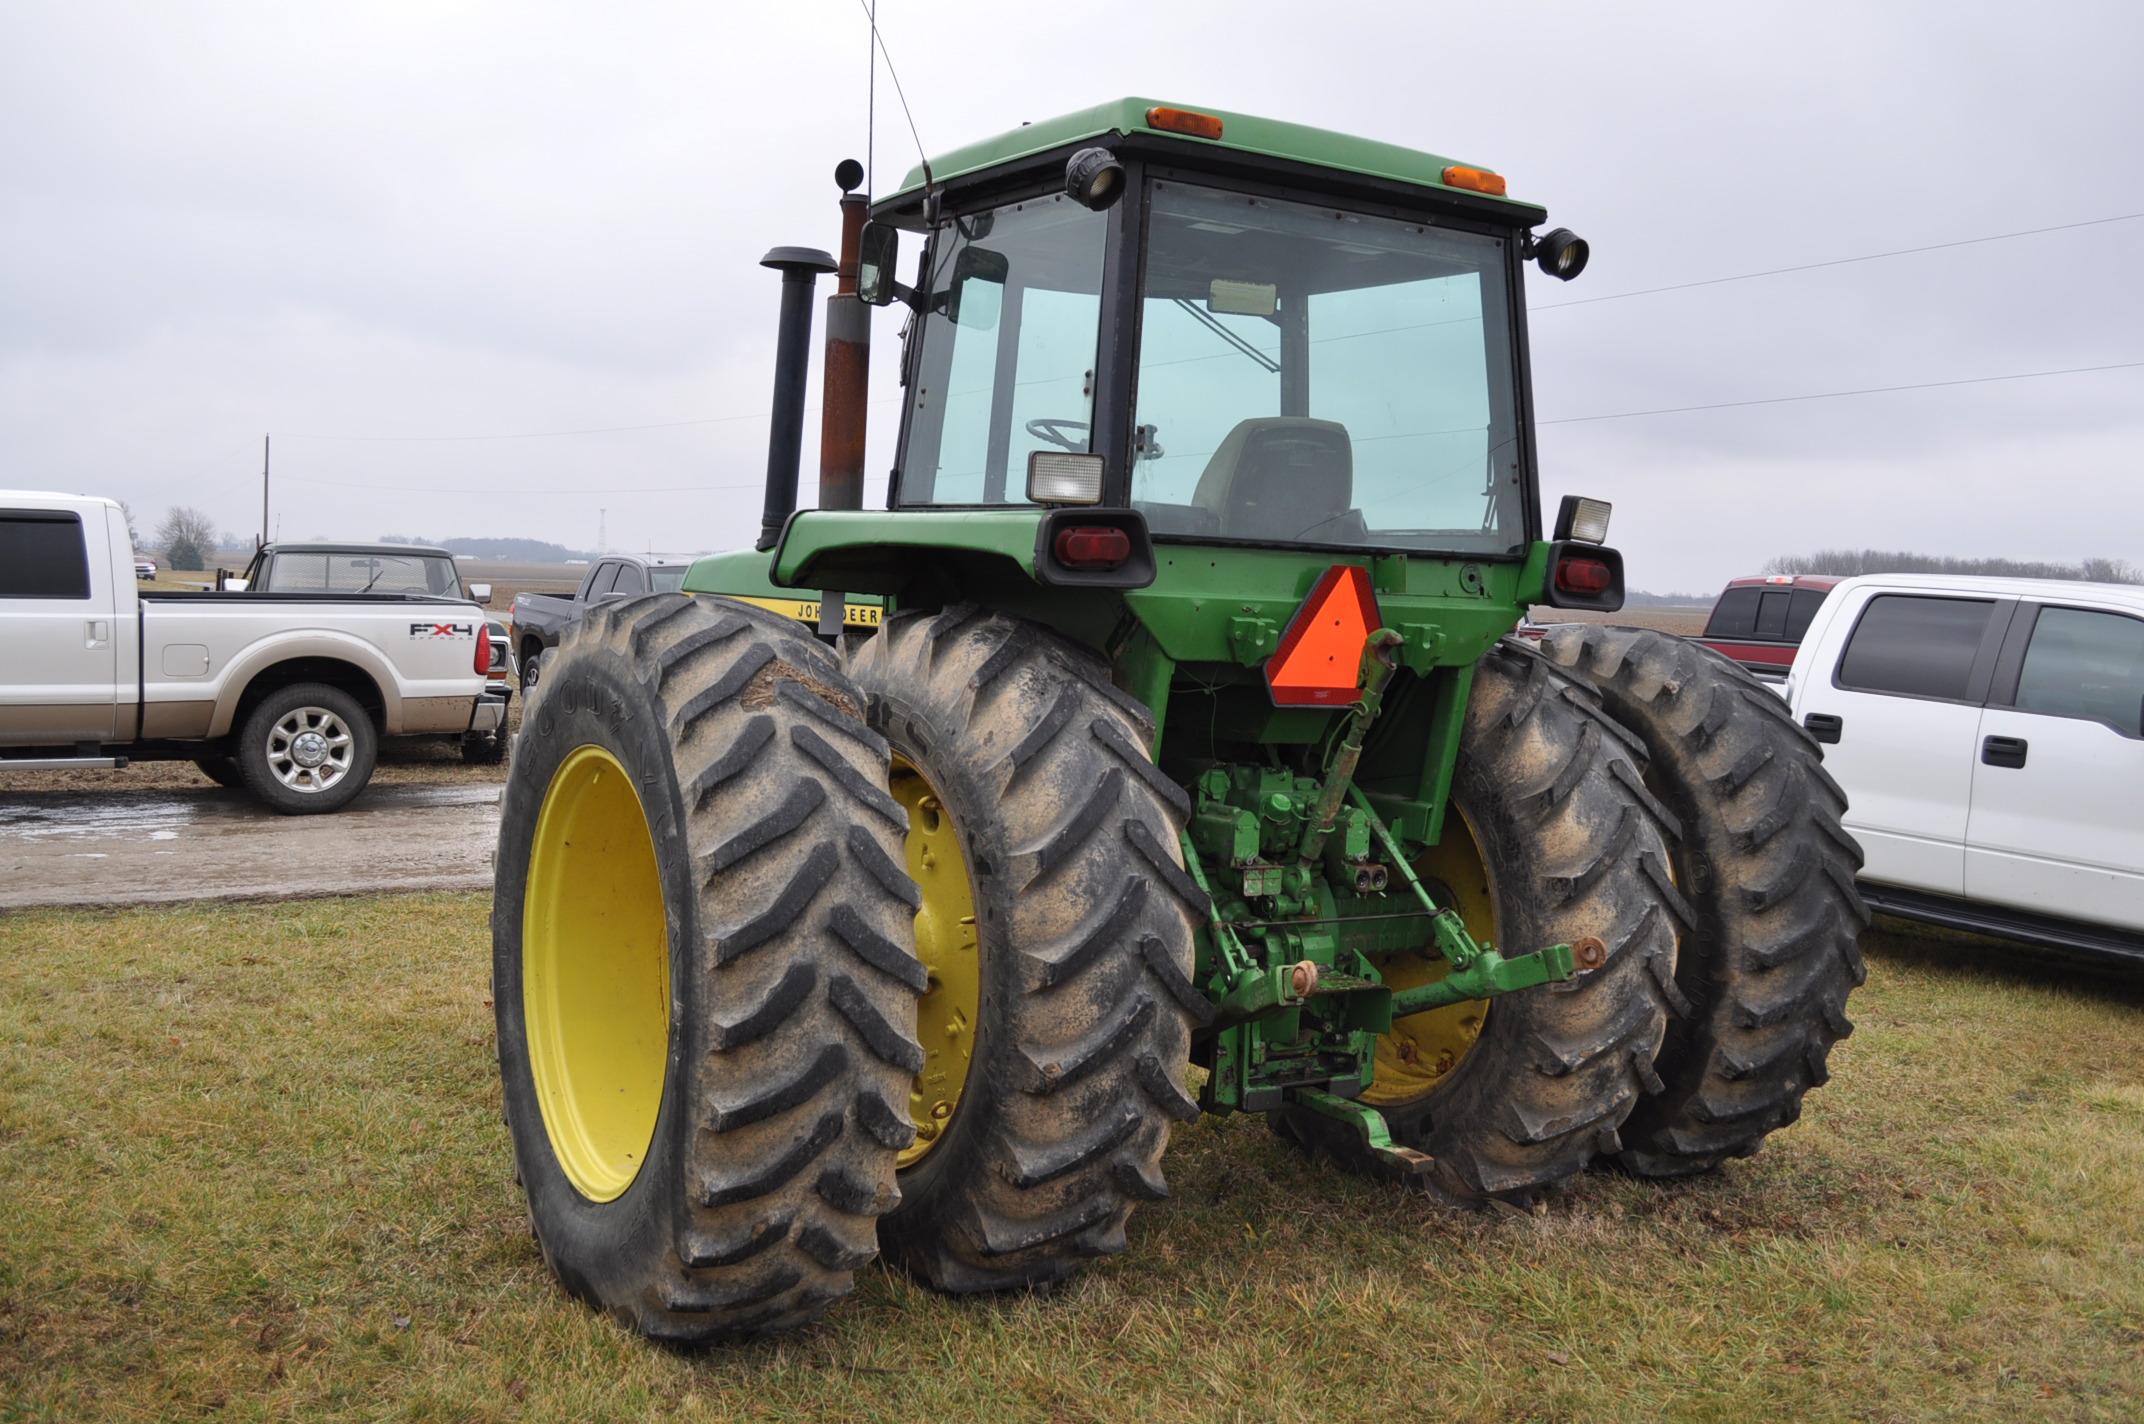 John Deere 4430 tractor, diesel, 18.4-34 hub duals, 10.00-16 front, CHA, Quad range, 2 hyd - Image 2 of 20